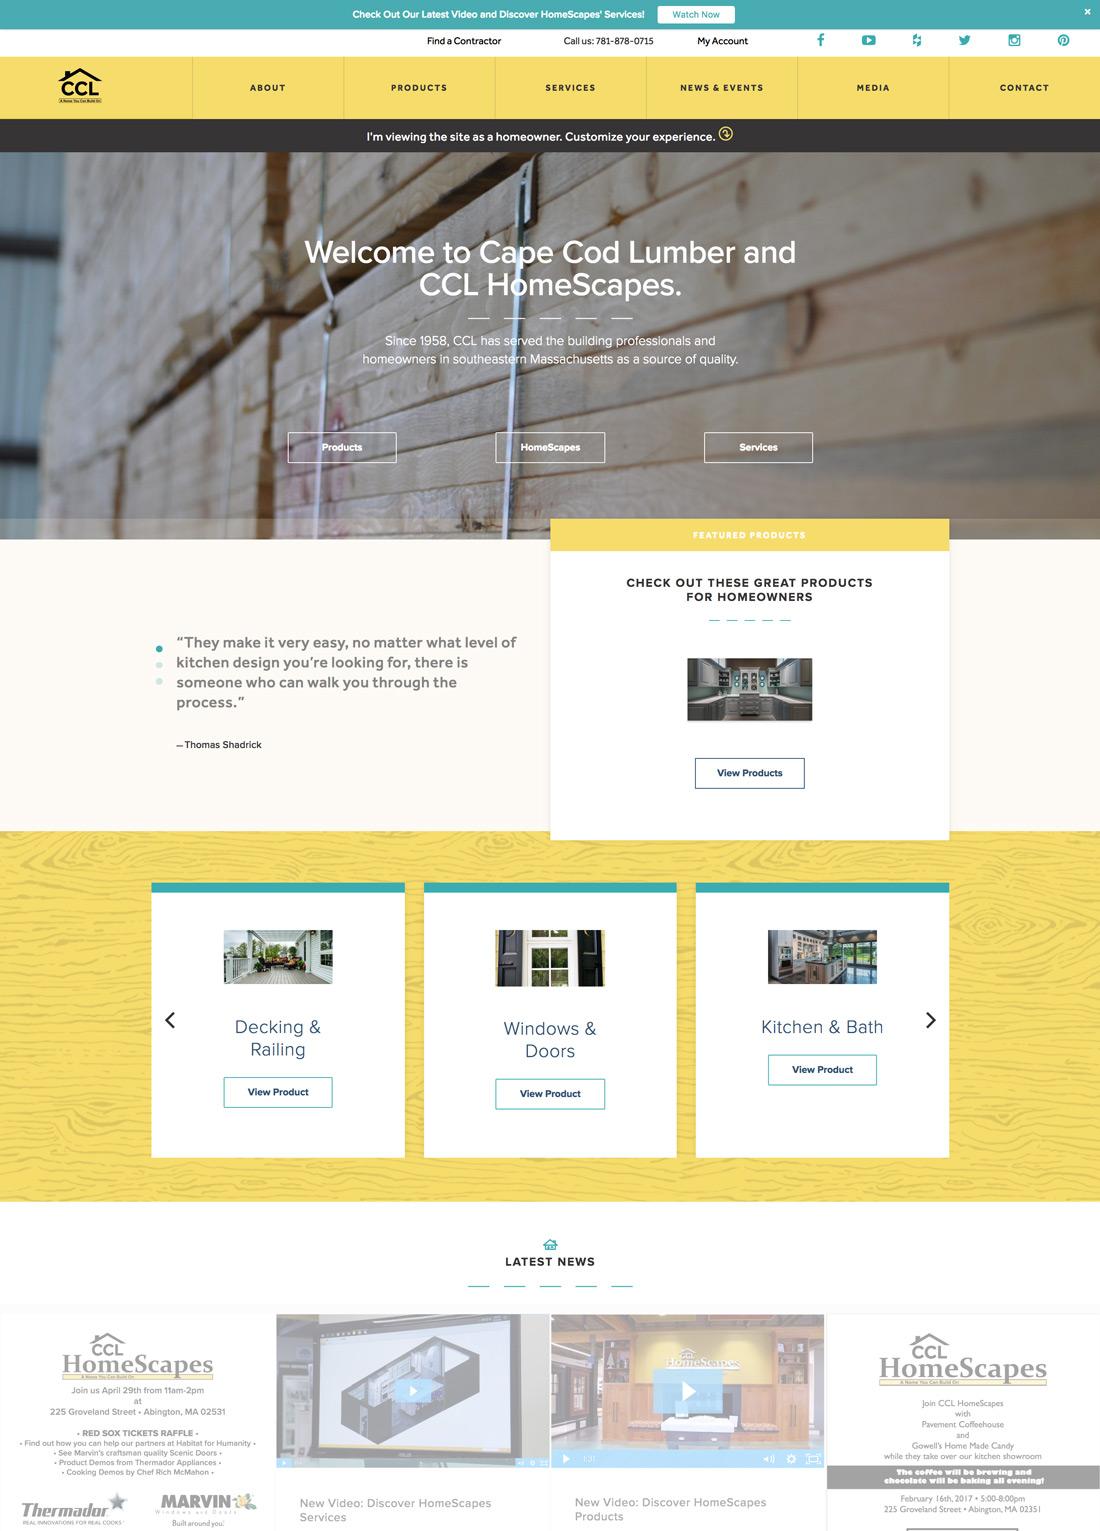 Homepage James Acero